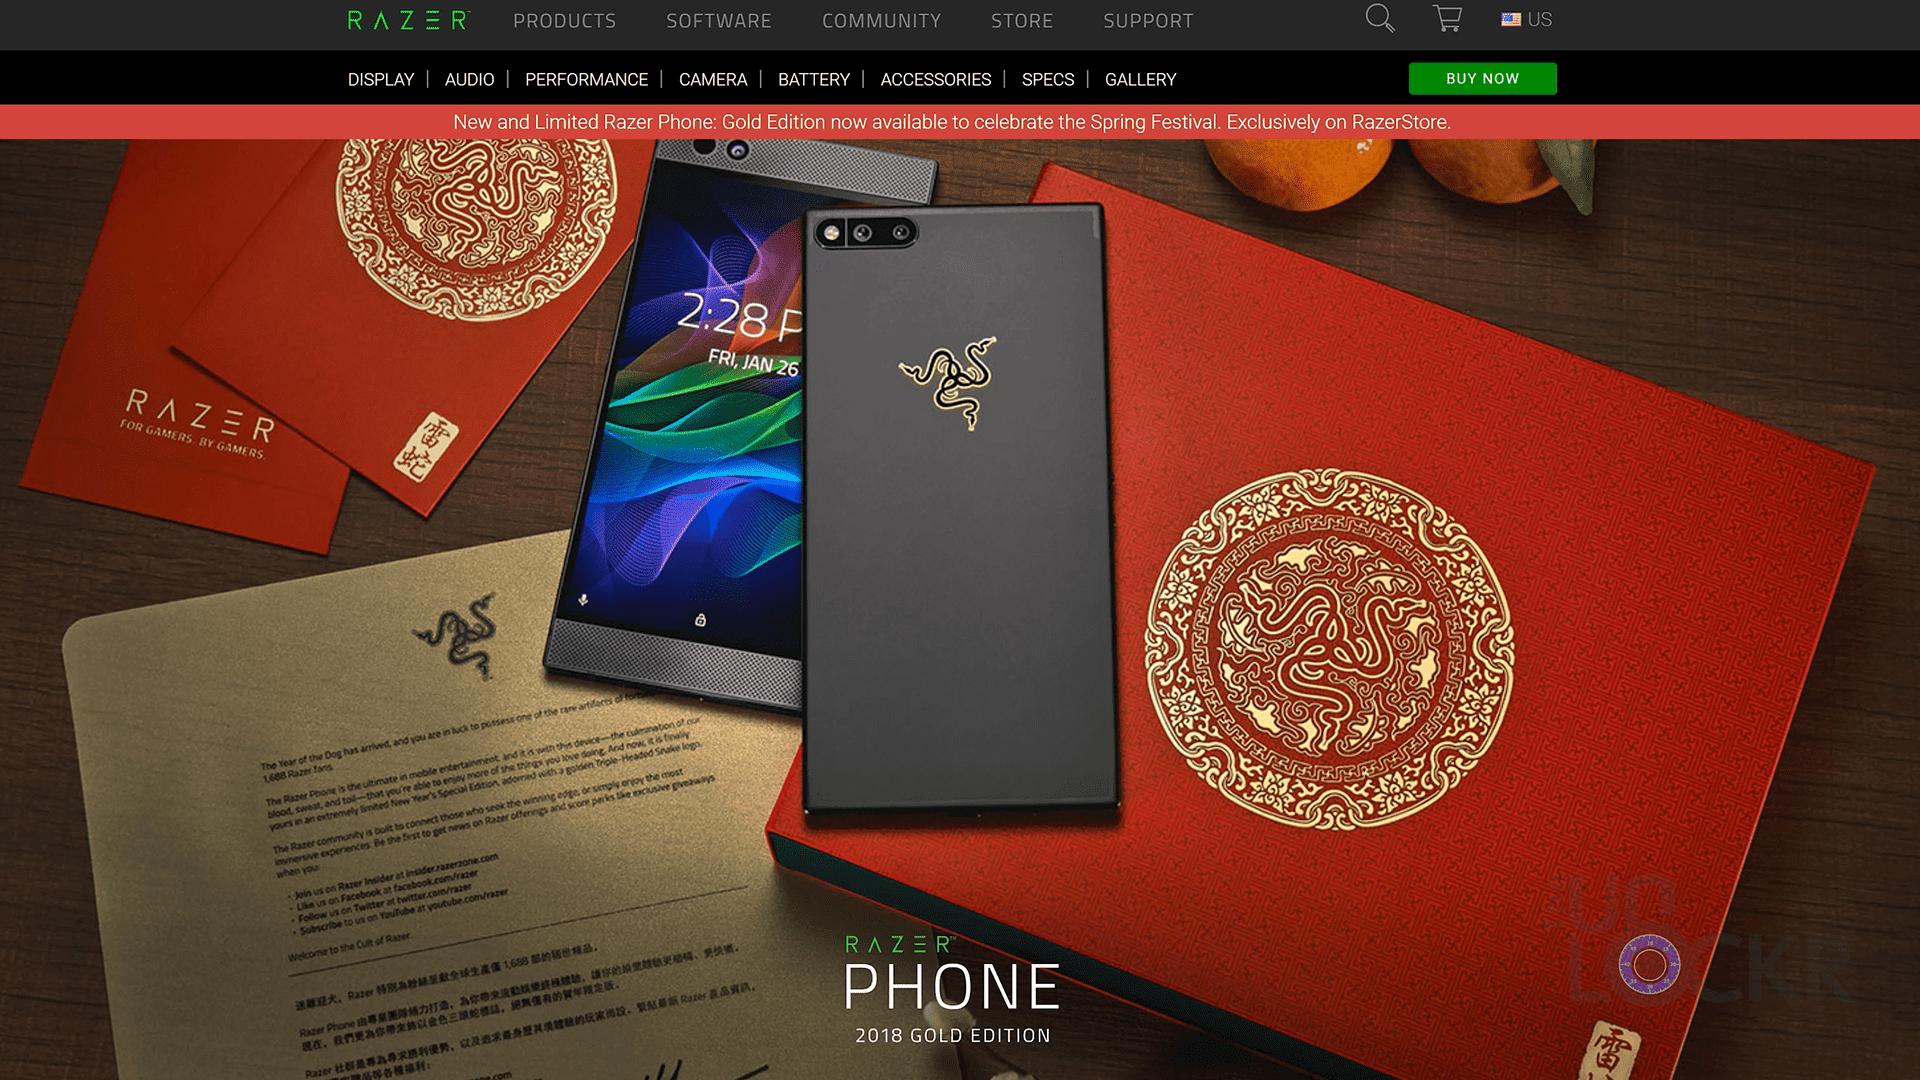 razer phone 2018 limited gold edition